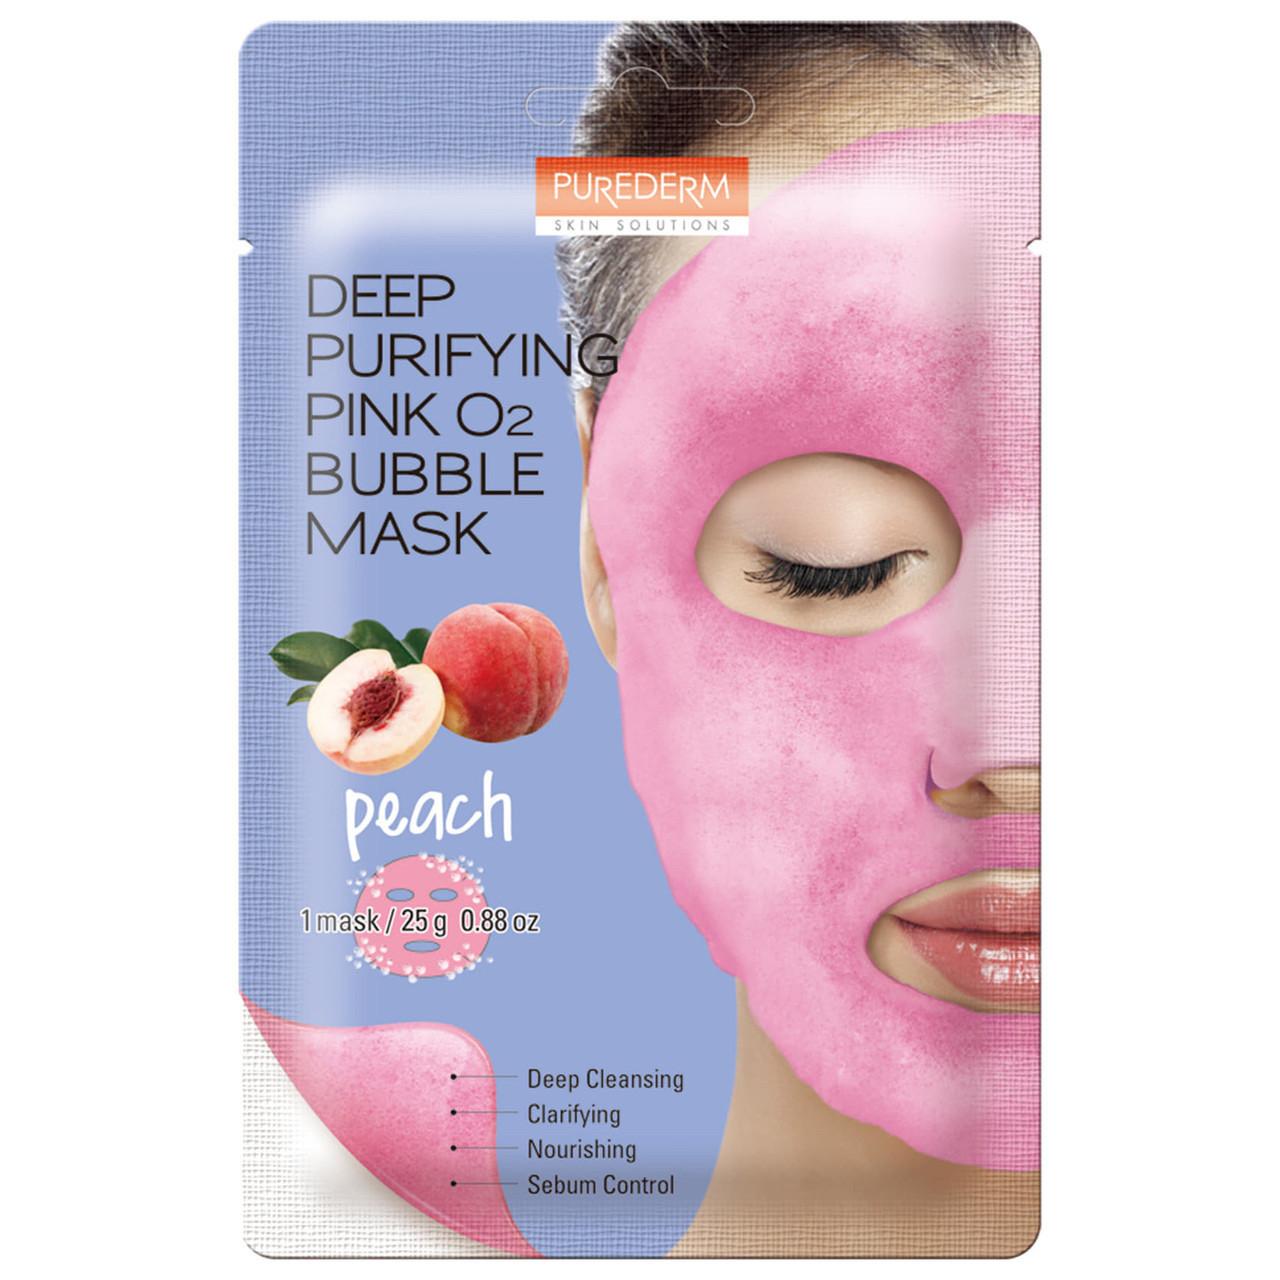 Киснева тканинна маска з екстрактом персика Purederm Deep Purifying Pink O2 bubble mask Peach